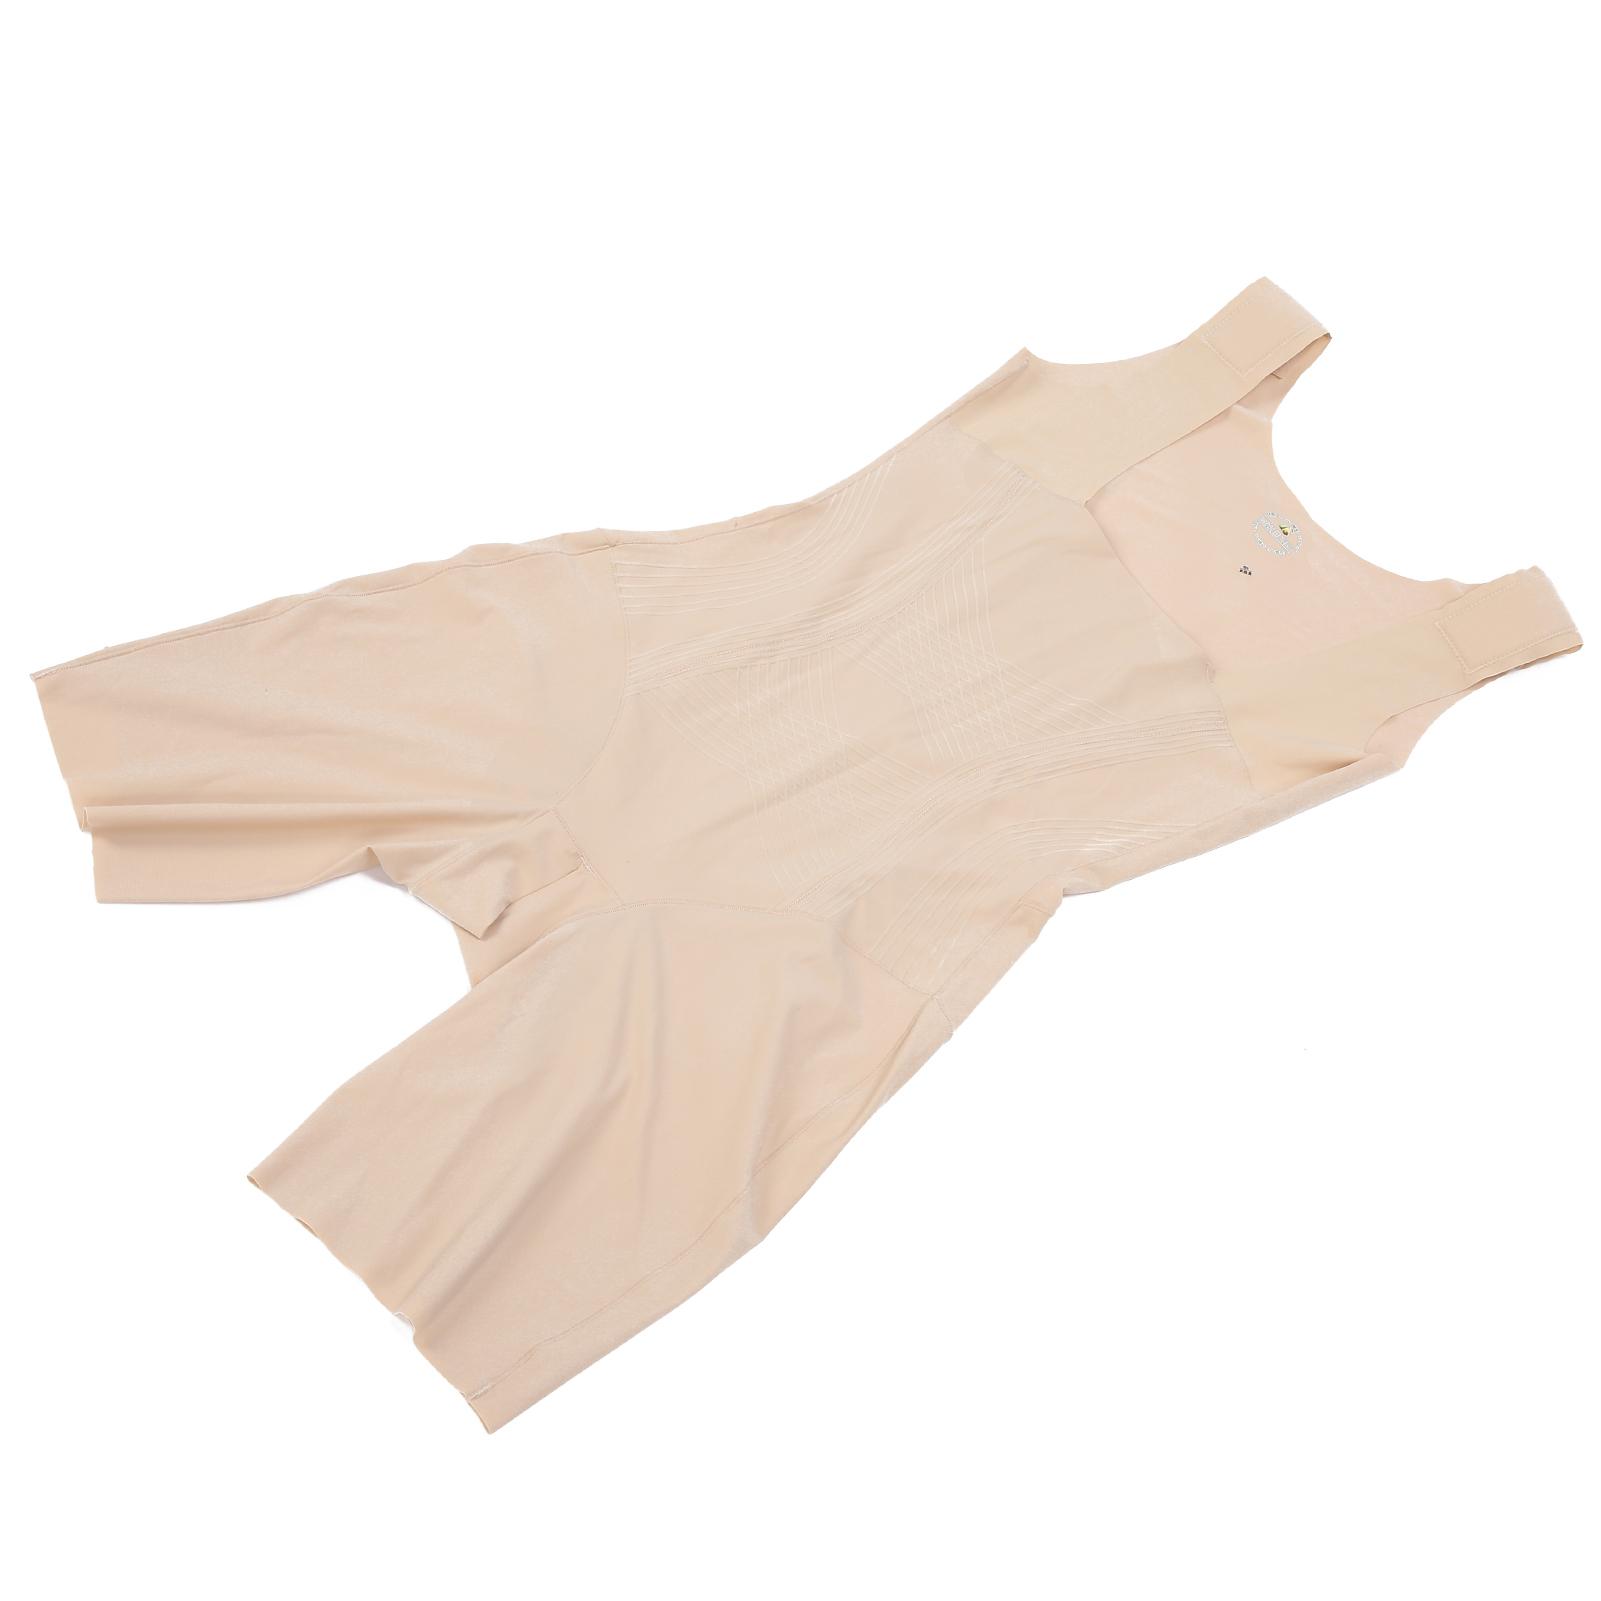 miniature 24 - Women's Full Body Taille Trainer Shaper Taille Corset underbust corset shapewear